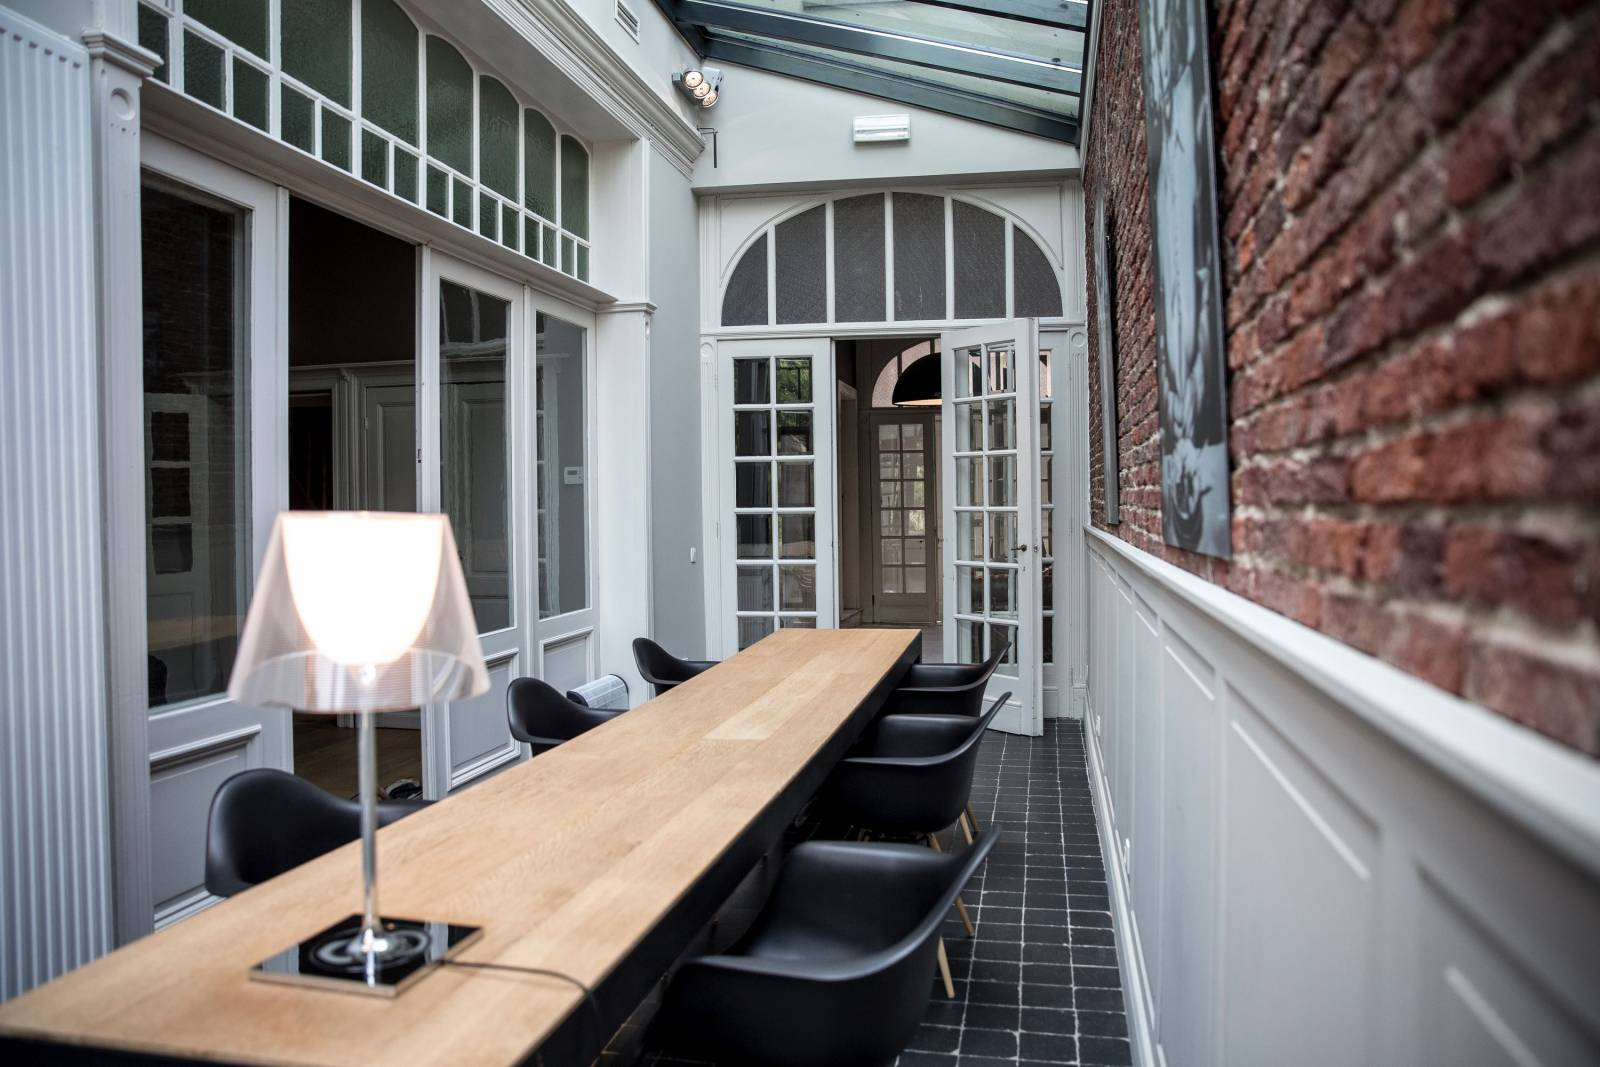 Léontine!by Huis Roos - Bruidsjuwelen - Trouwring - Verlovingsring - House of Weddings - 22